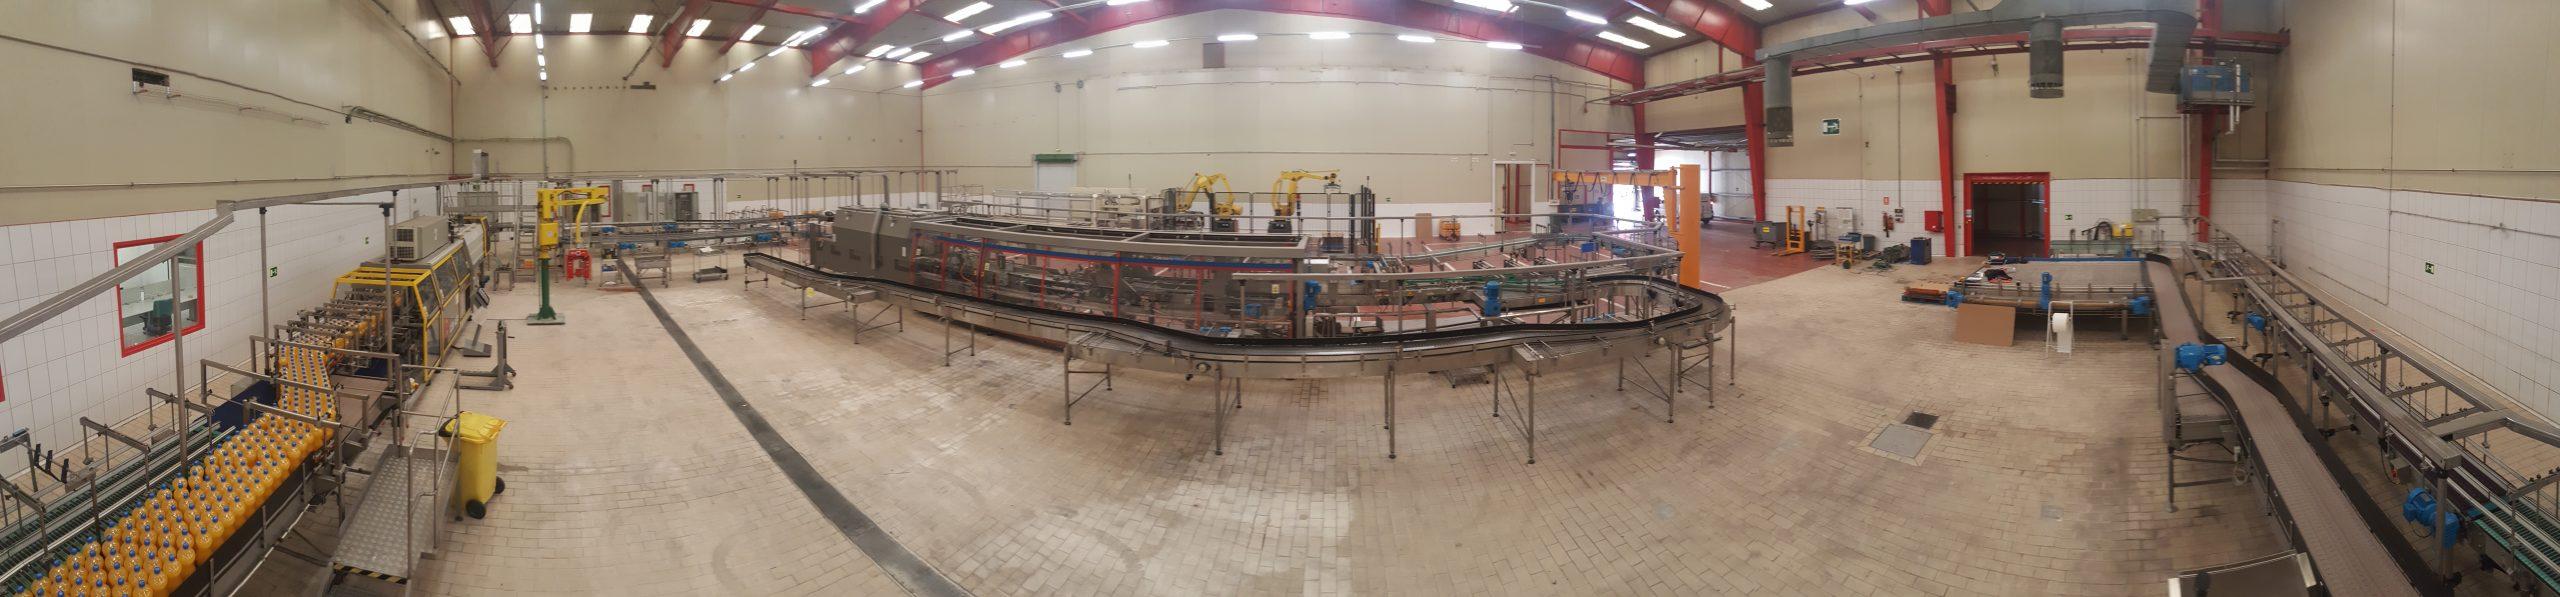 Línea Completa - ENVASER